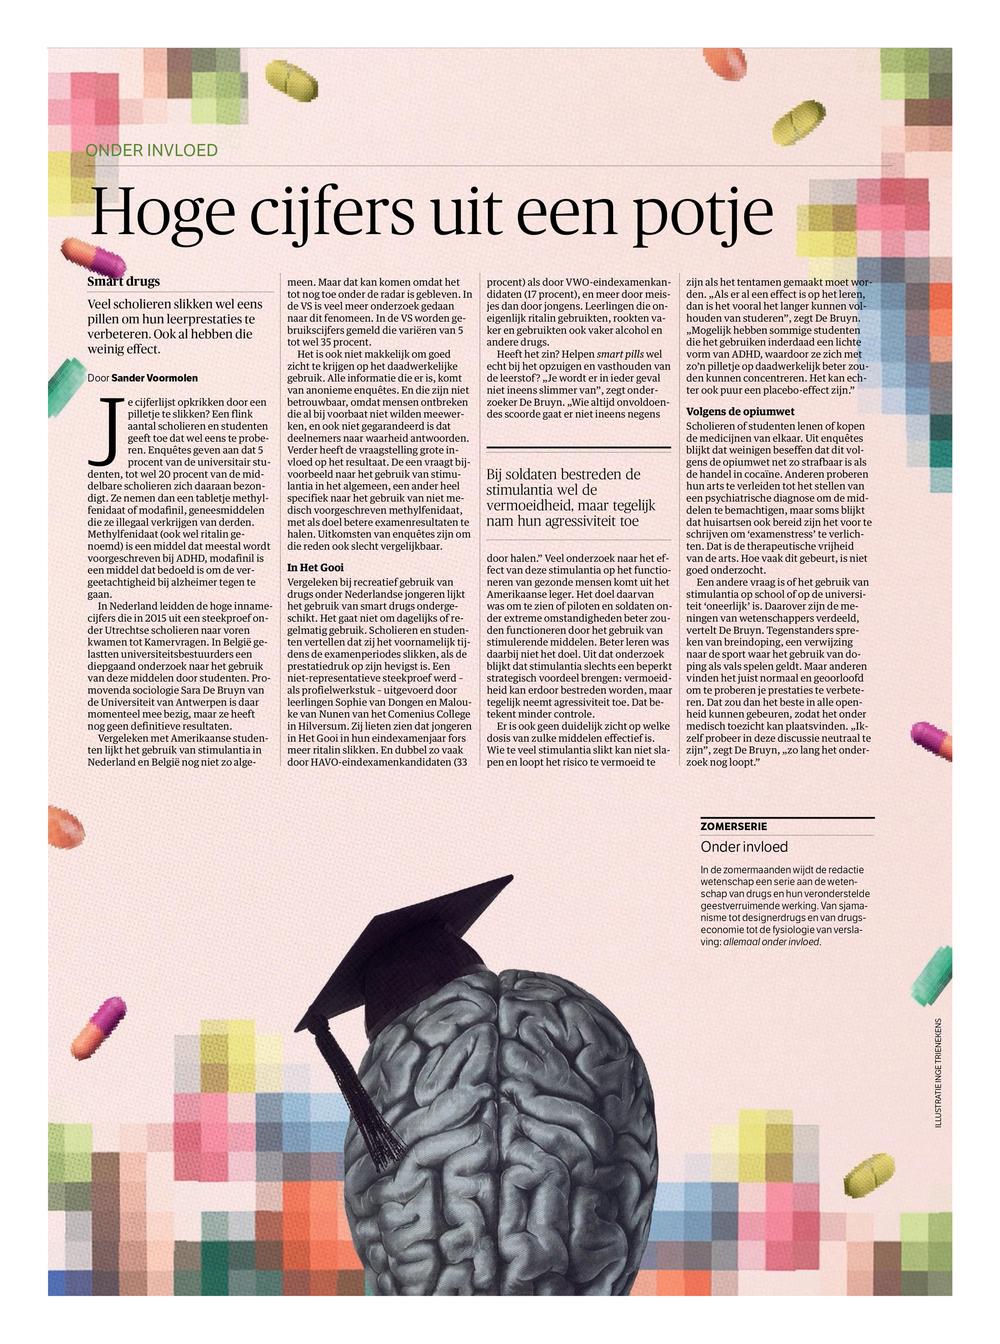 NRC_Handelsblad_20160709_2_08_2.jpg